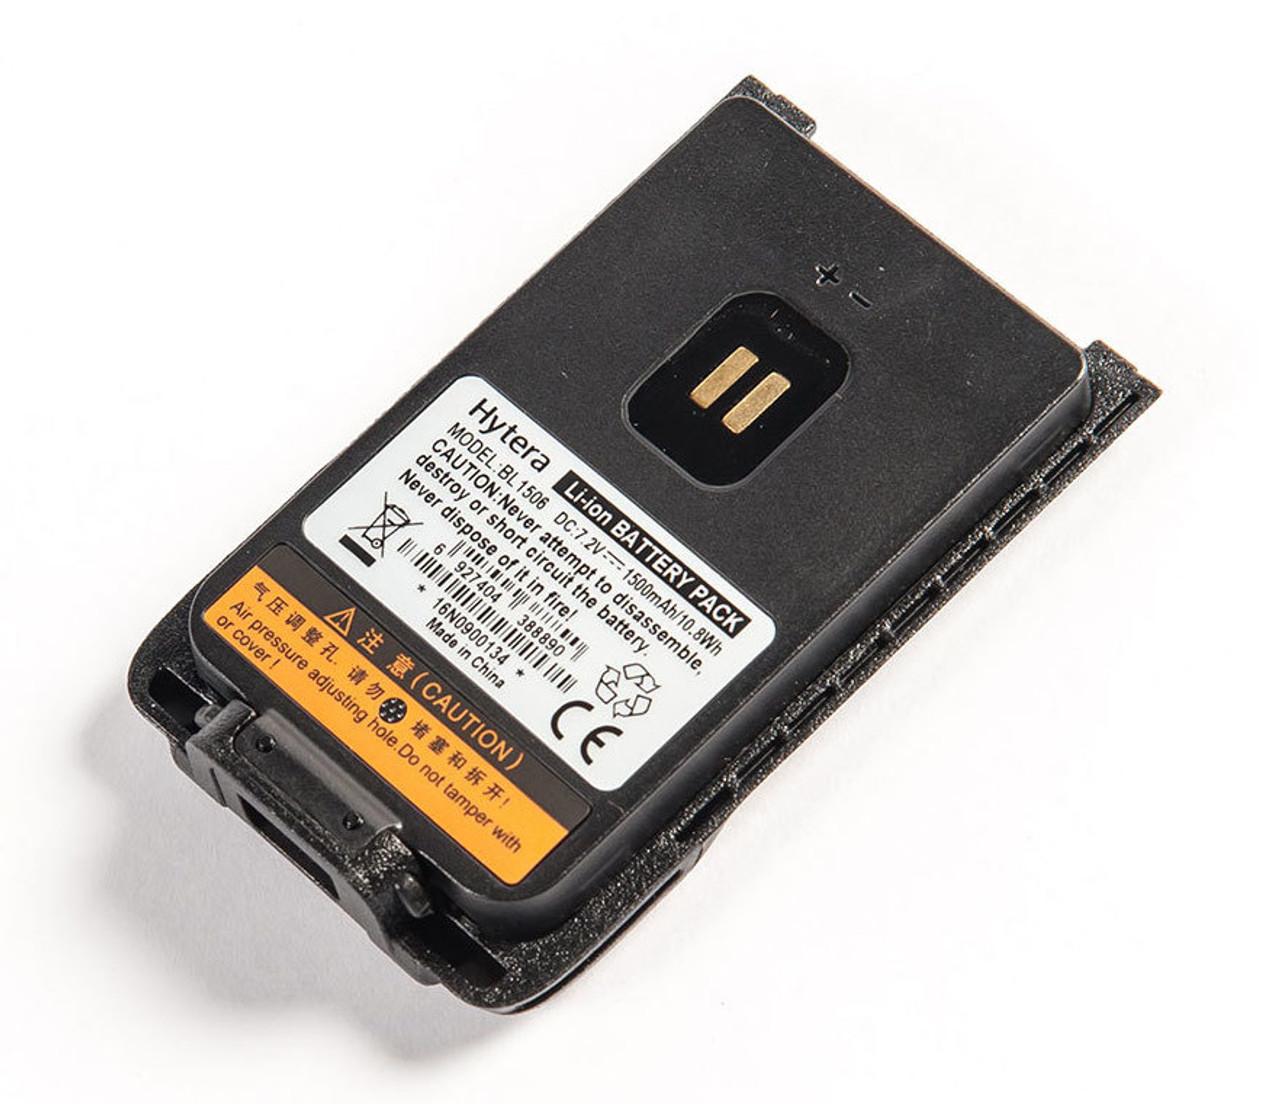 Hytera BL1506 1500 mAh Lithium Ion Battery